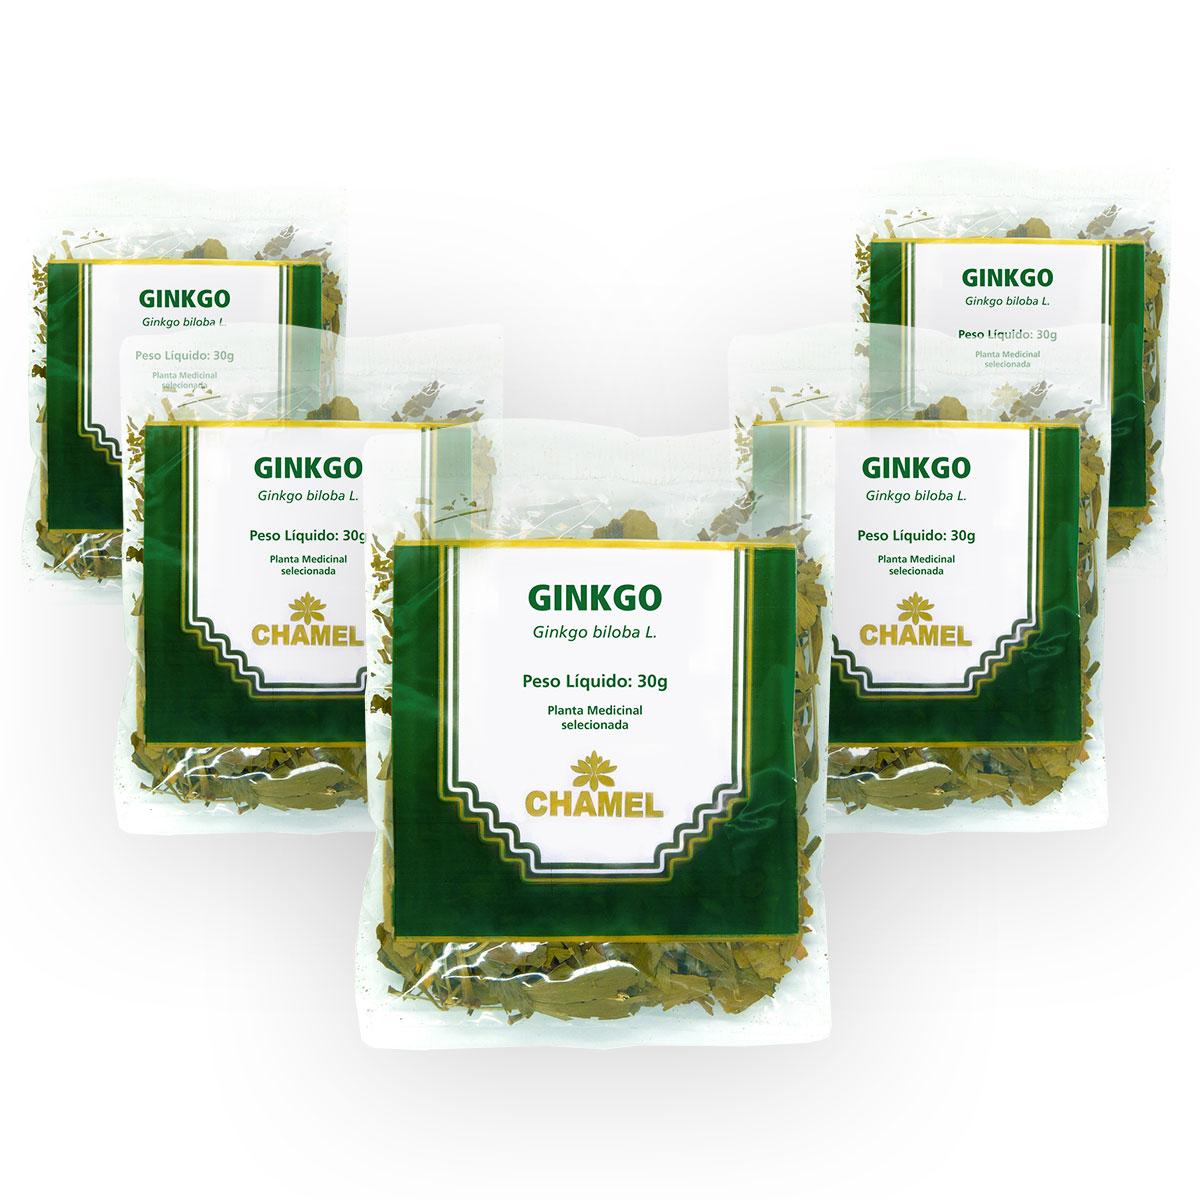 Ginkgo 30g Chamel com 5 Unidades - Chá-Folhas